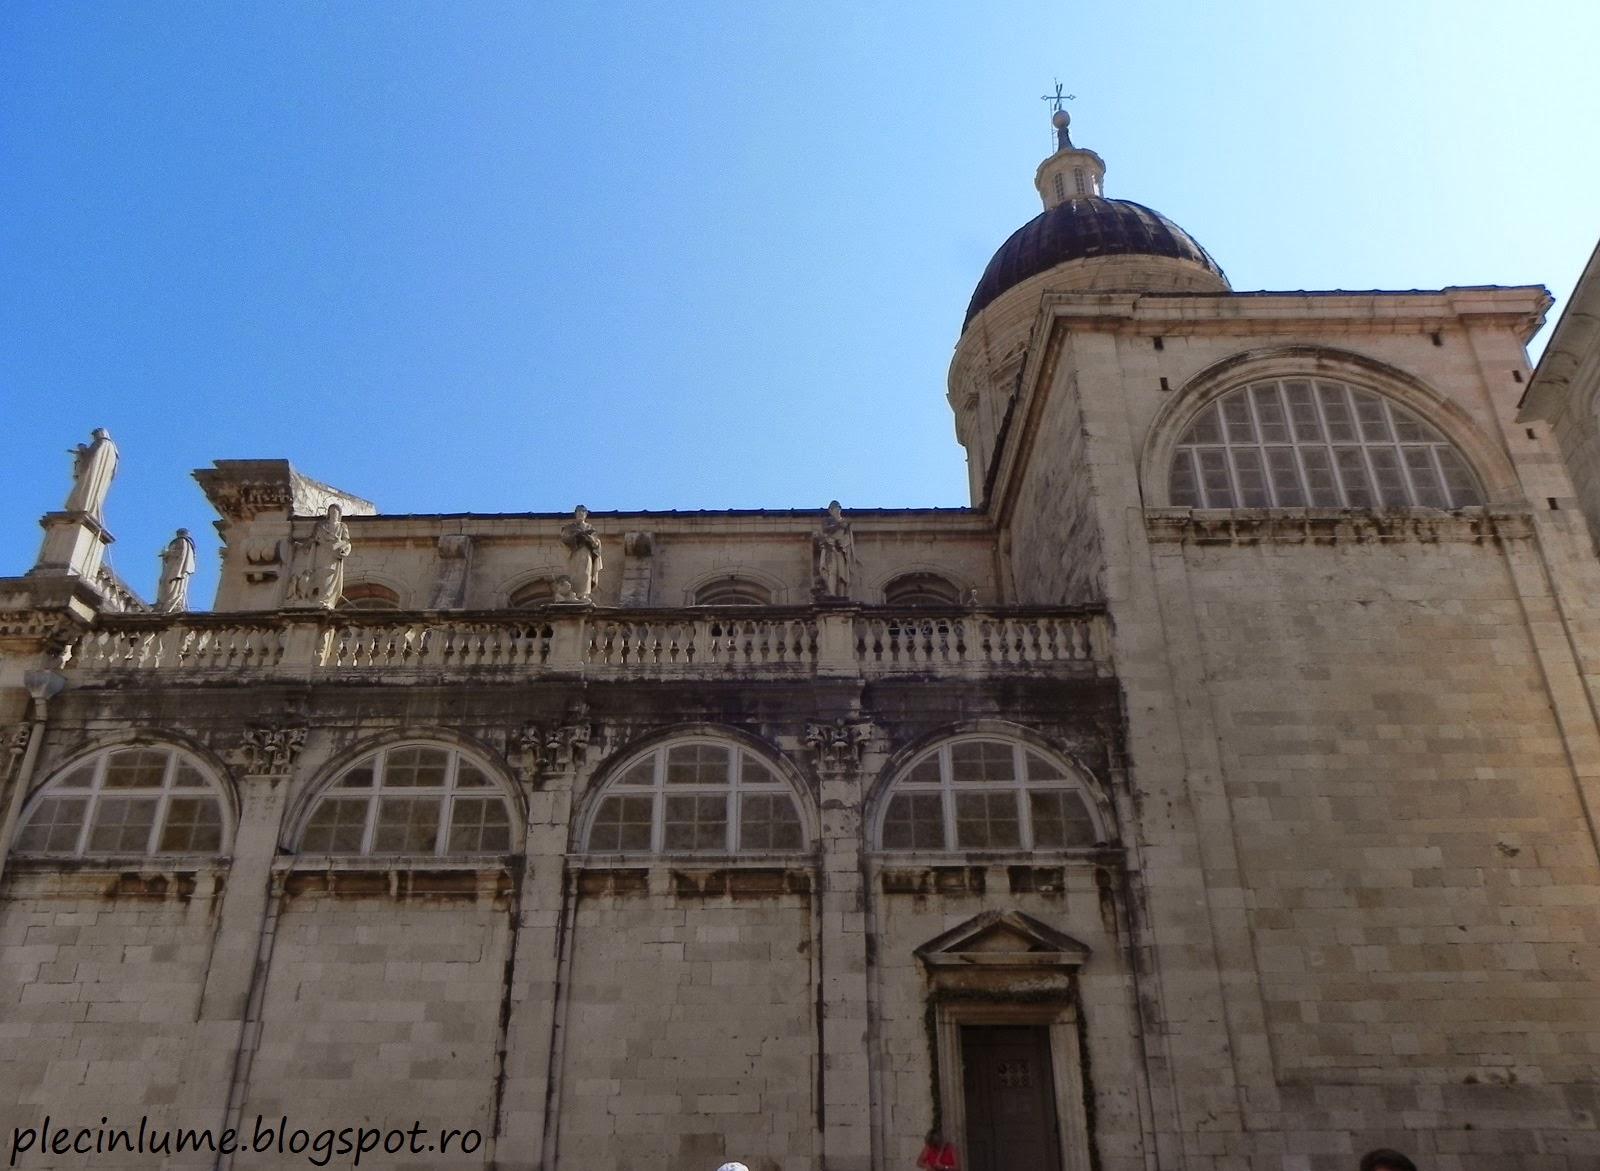 Cladire in Dubrovnik